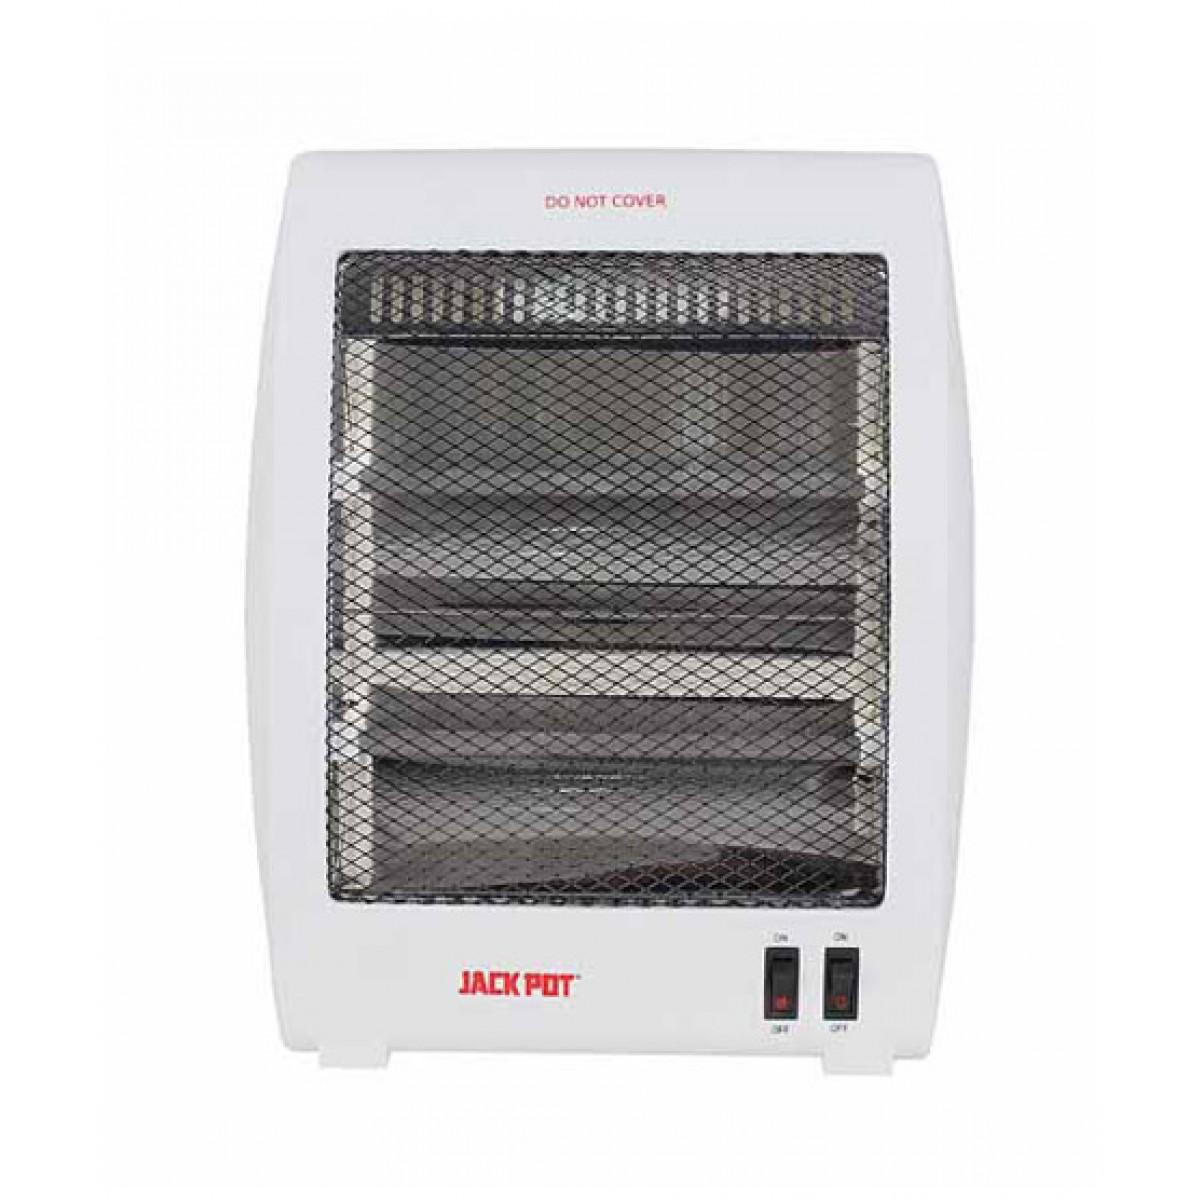 Jackpot Electrical Heater (JP-356)